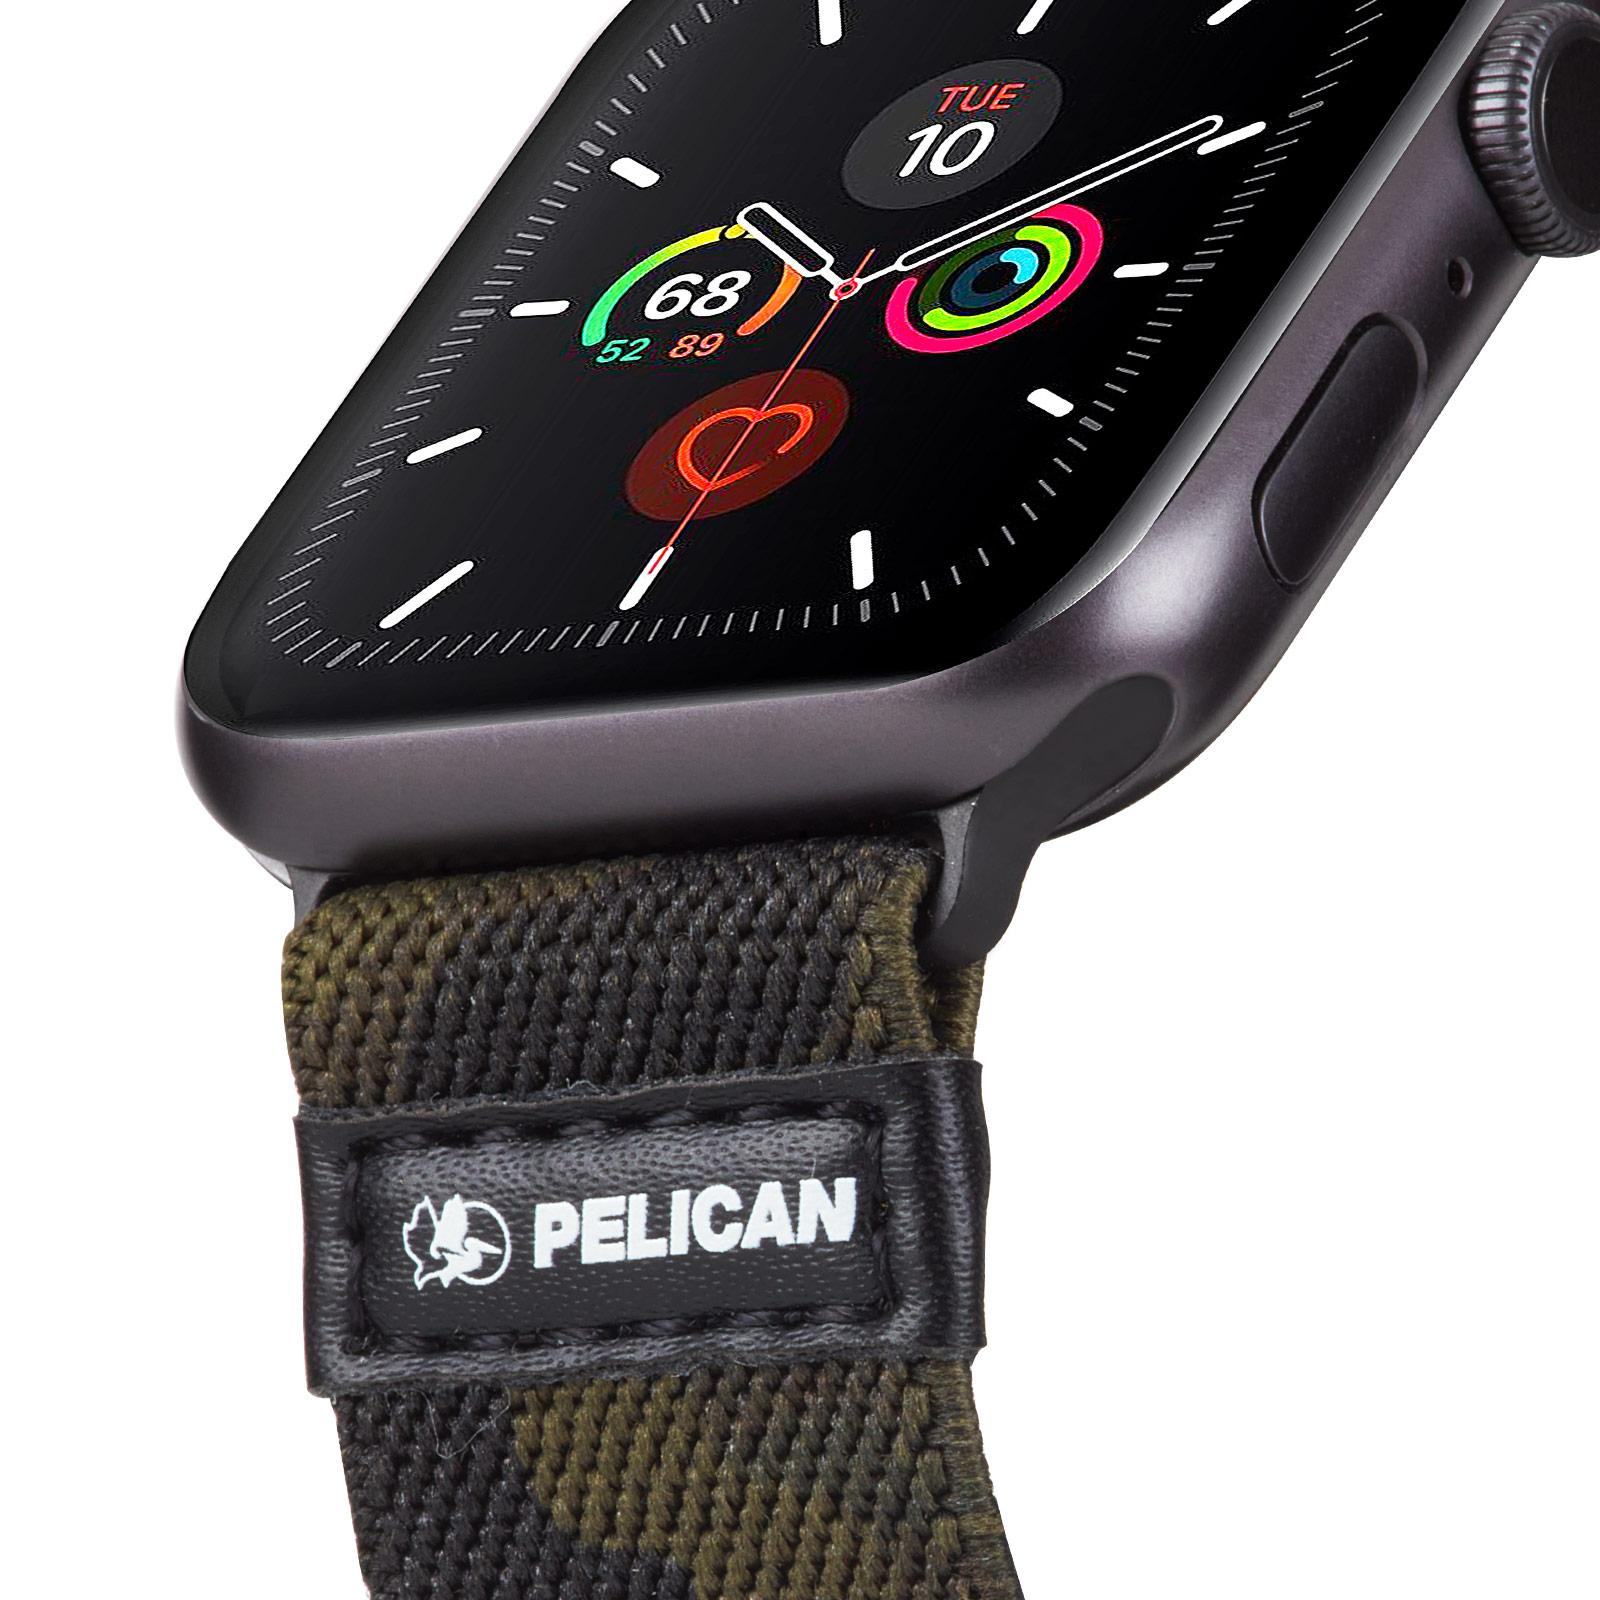 pelican pp043402 protector apple watch band strap camo